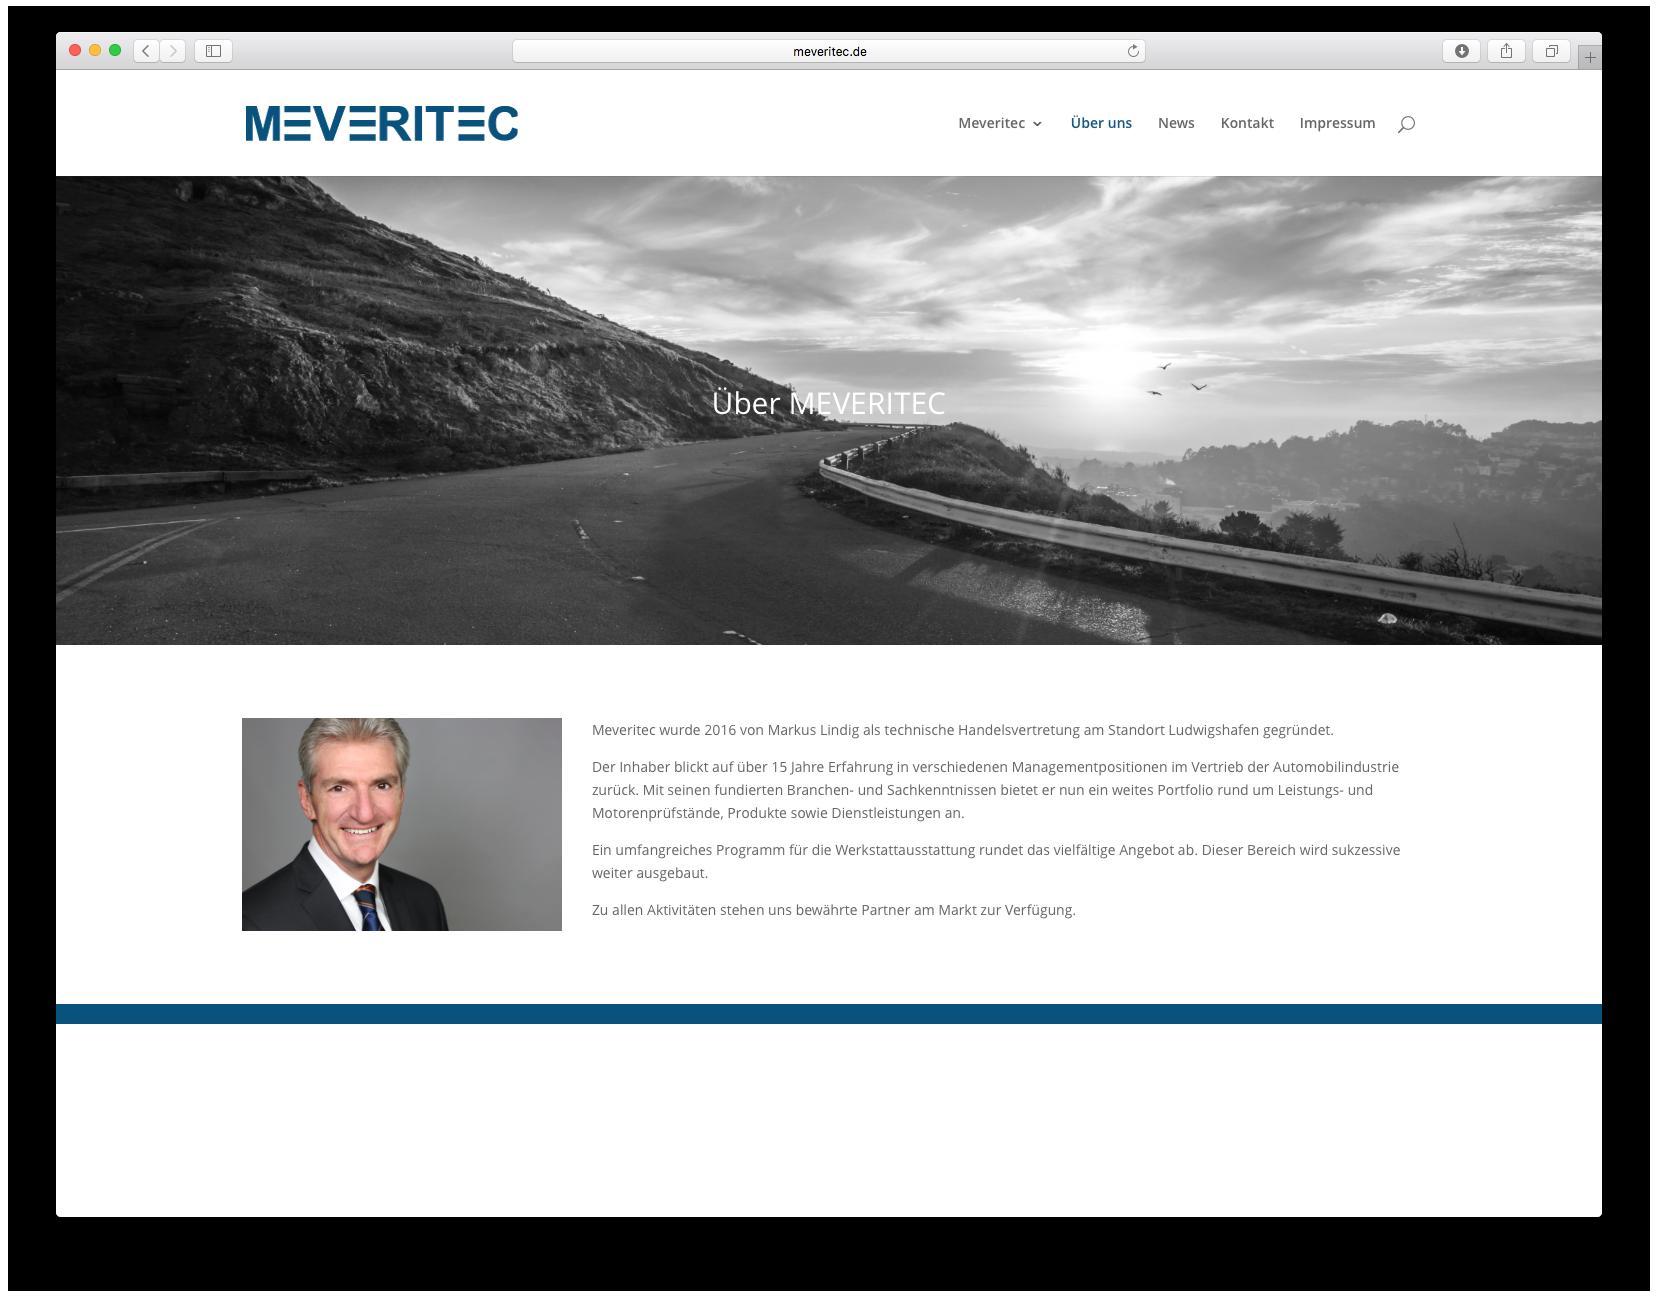 bk_meveritec_2